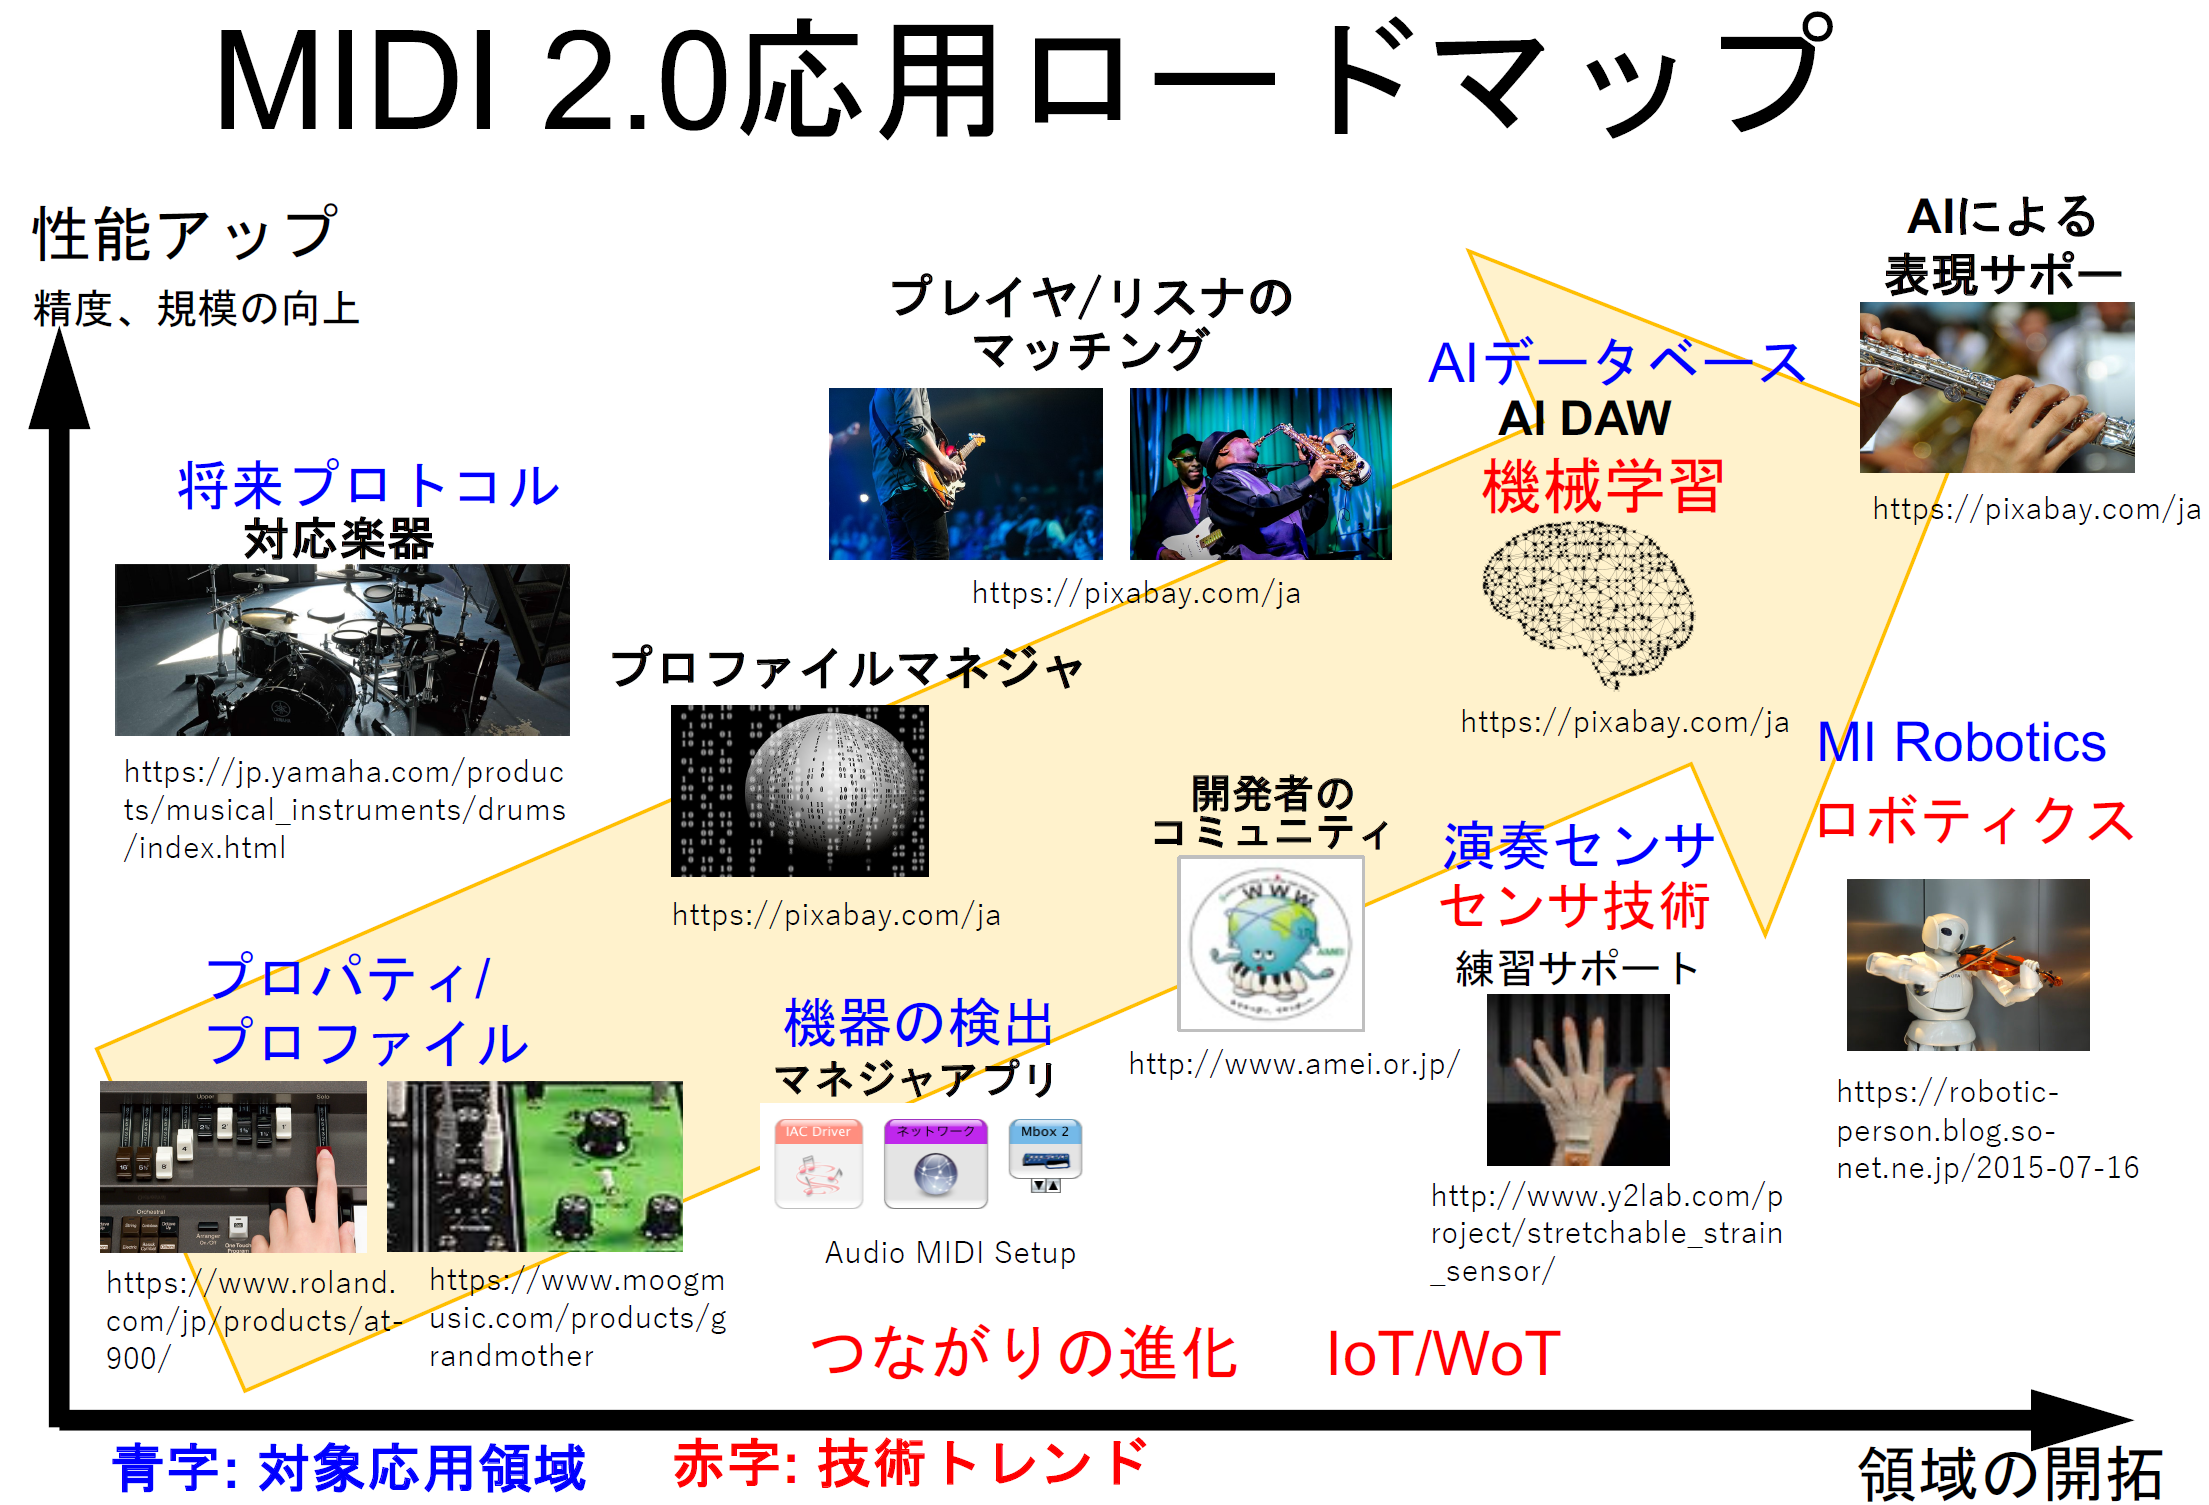 MIDI 2.0の規格書がダウンロード開始 AI x DAW活用の未来も示唆